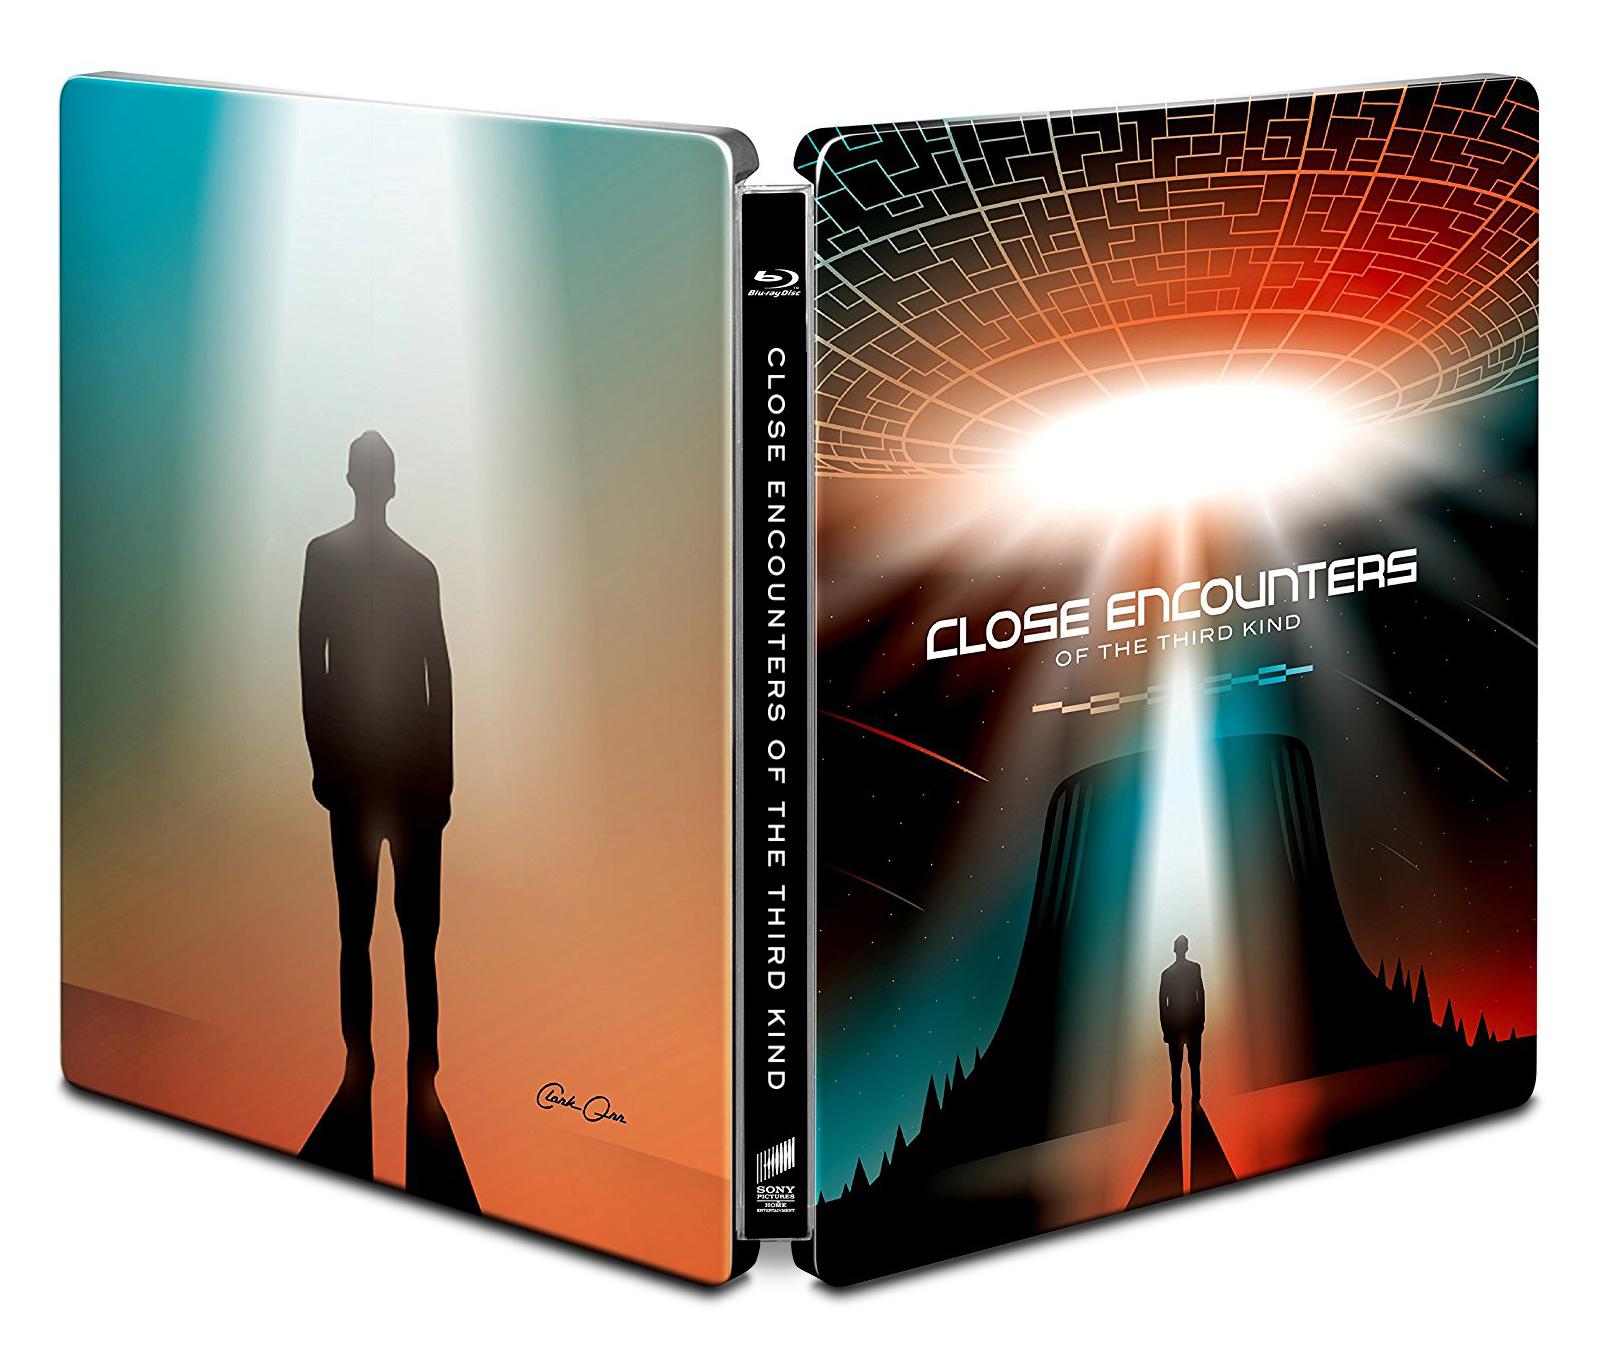 CODC_close_encounters_dvd3.jpg